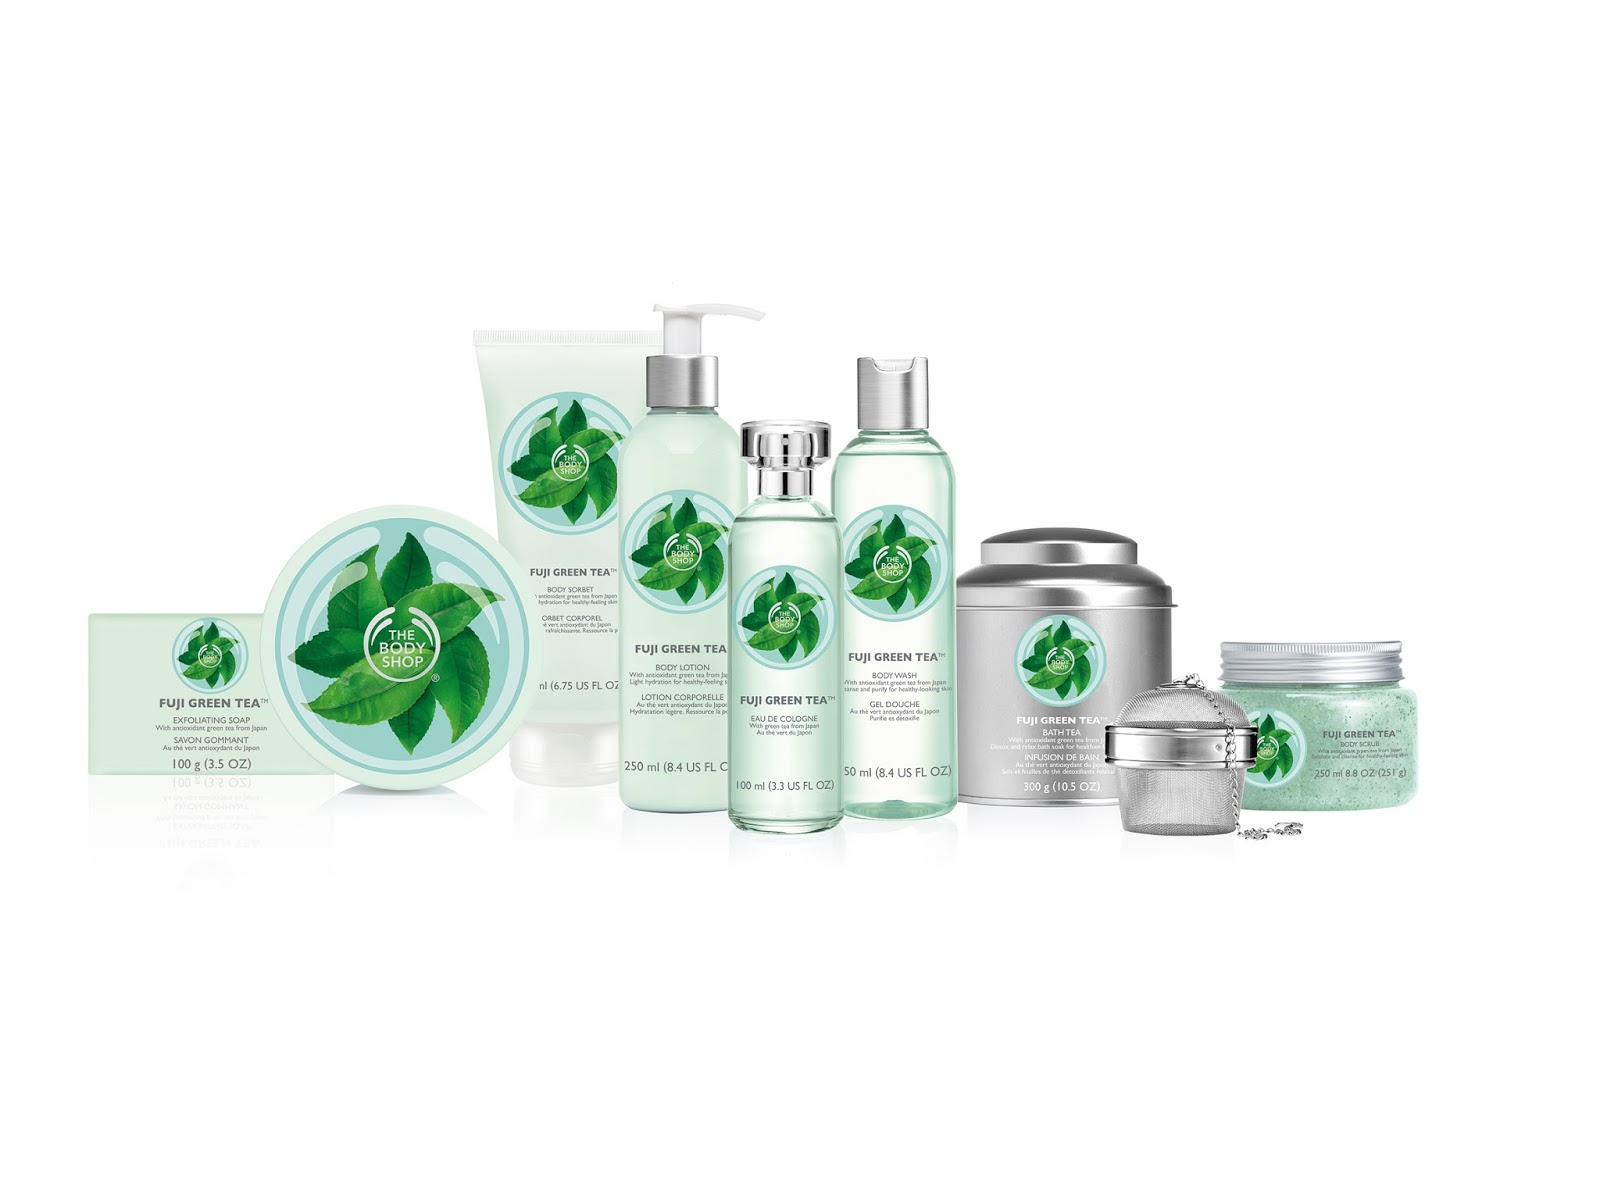 The Body Shop Fuji Green Tea Range